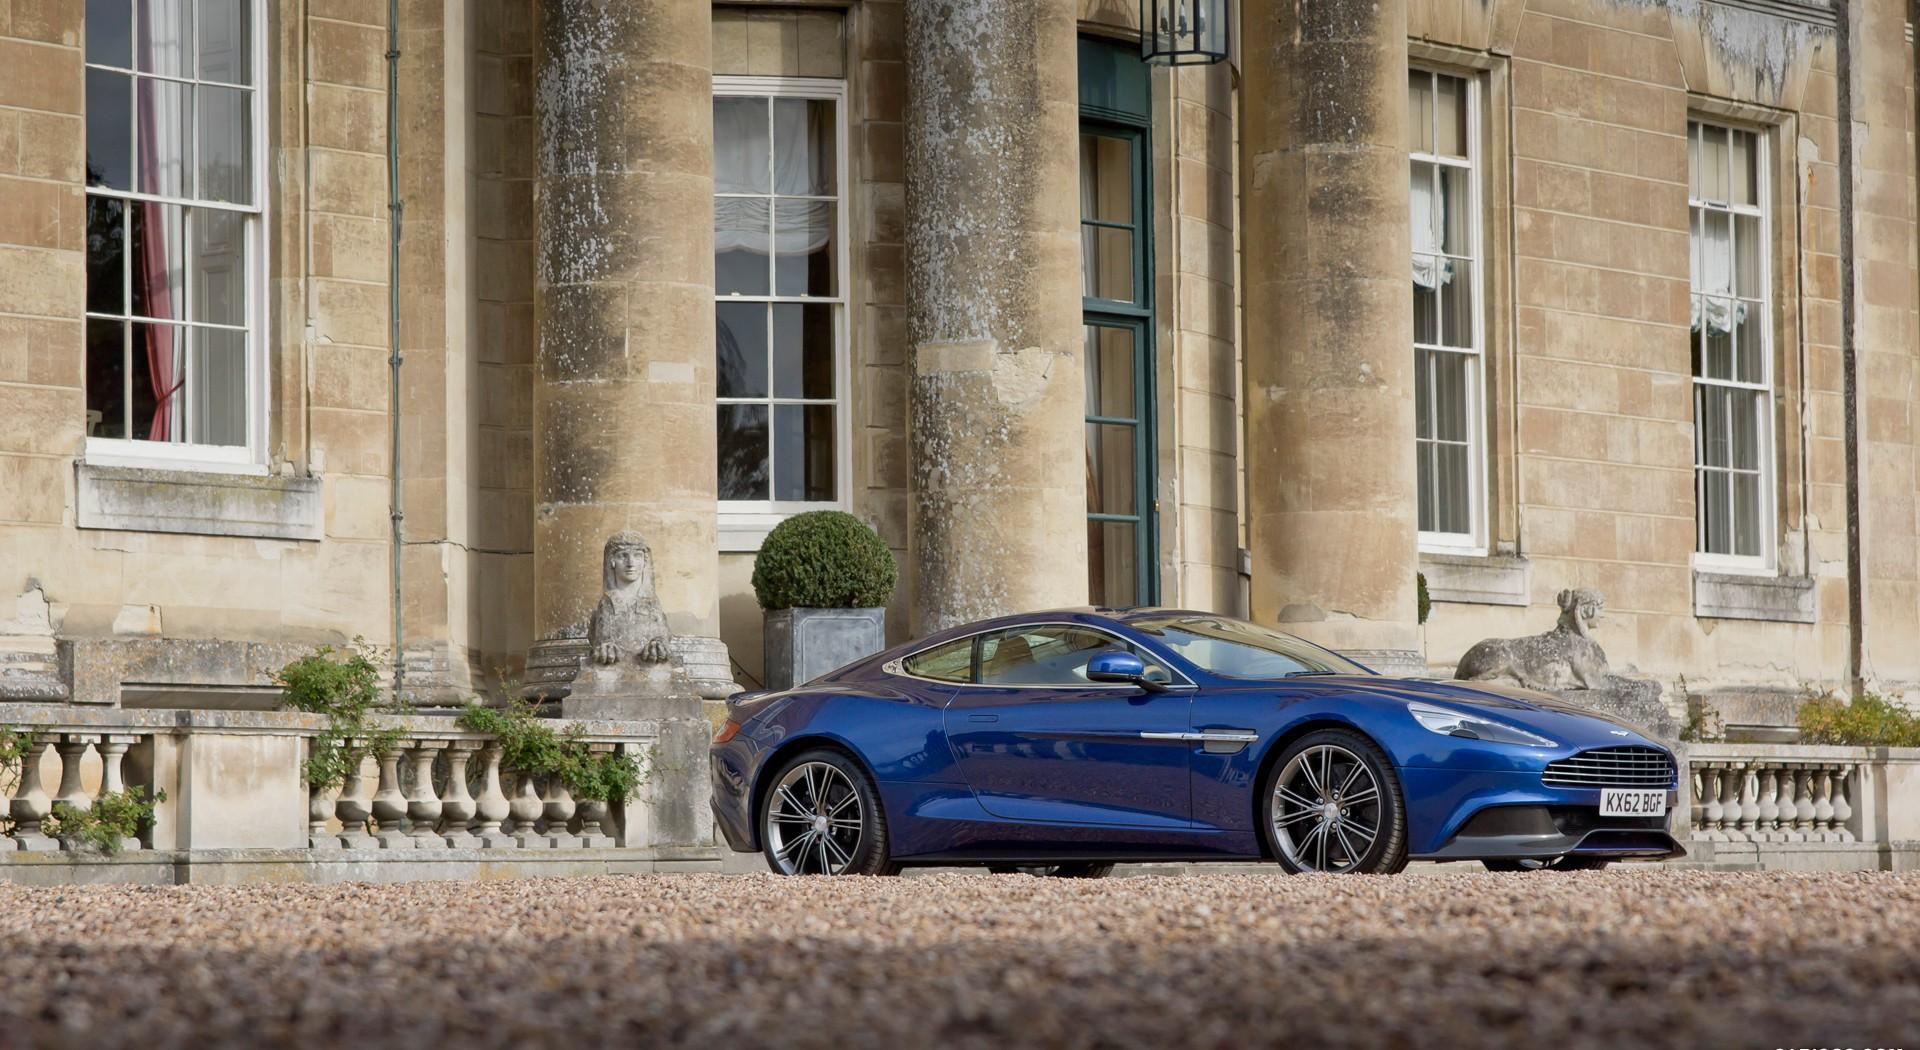 Aston Martin Vanquish blue cool